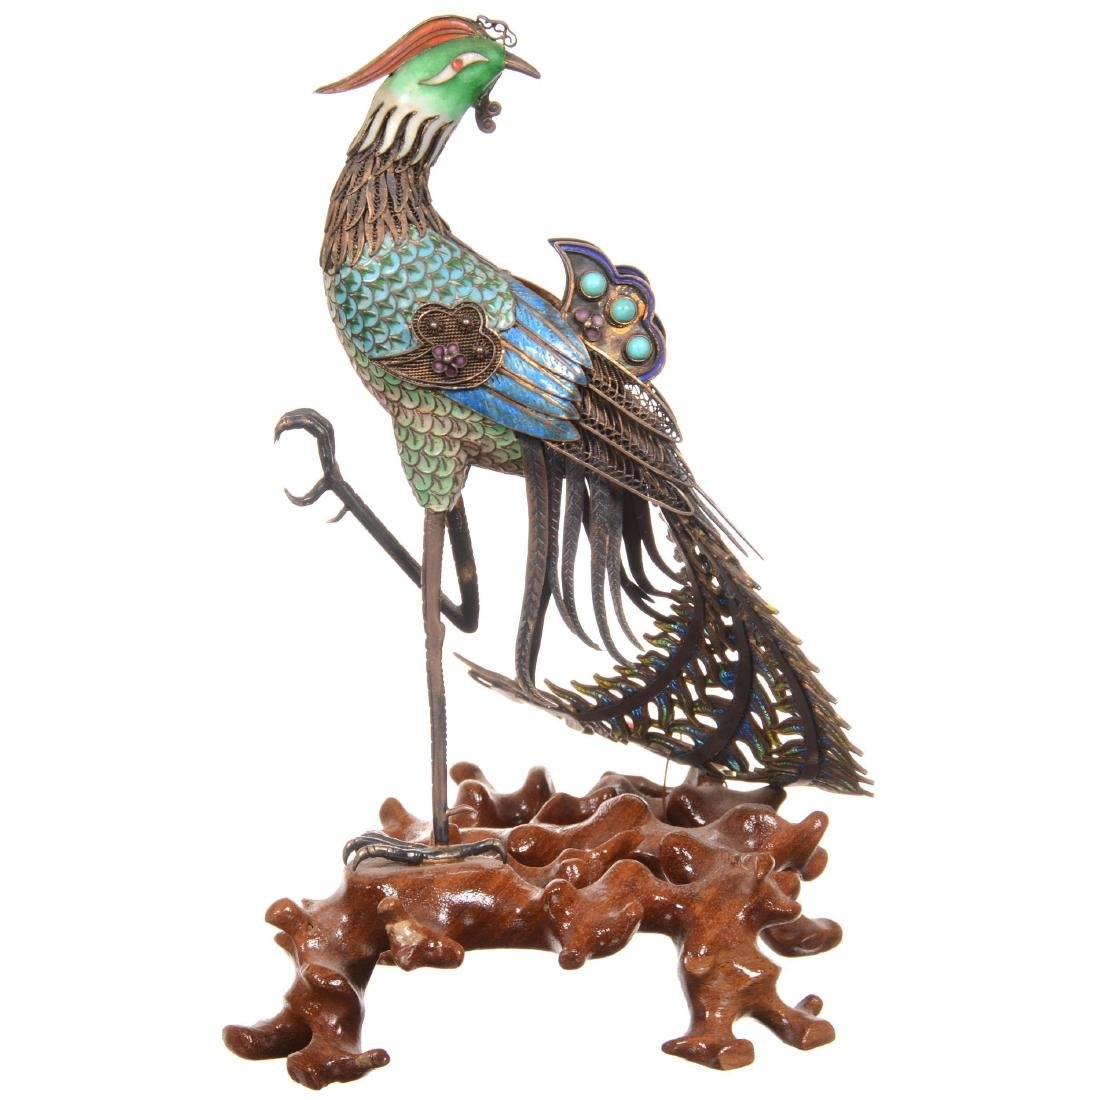 Chinese Silver & Enamel Figural Peacock on Teakwood Sta - 2